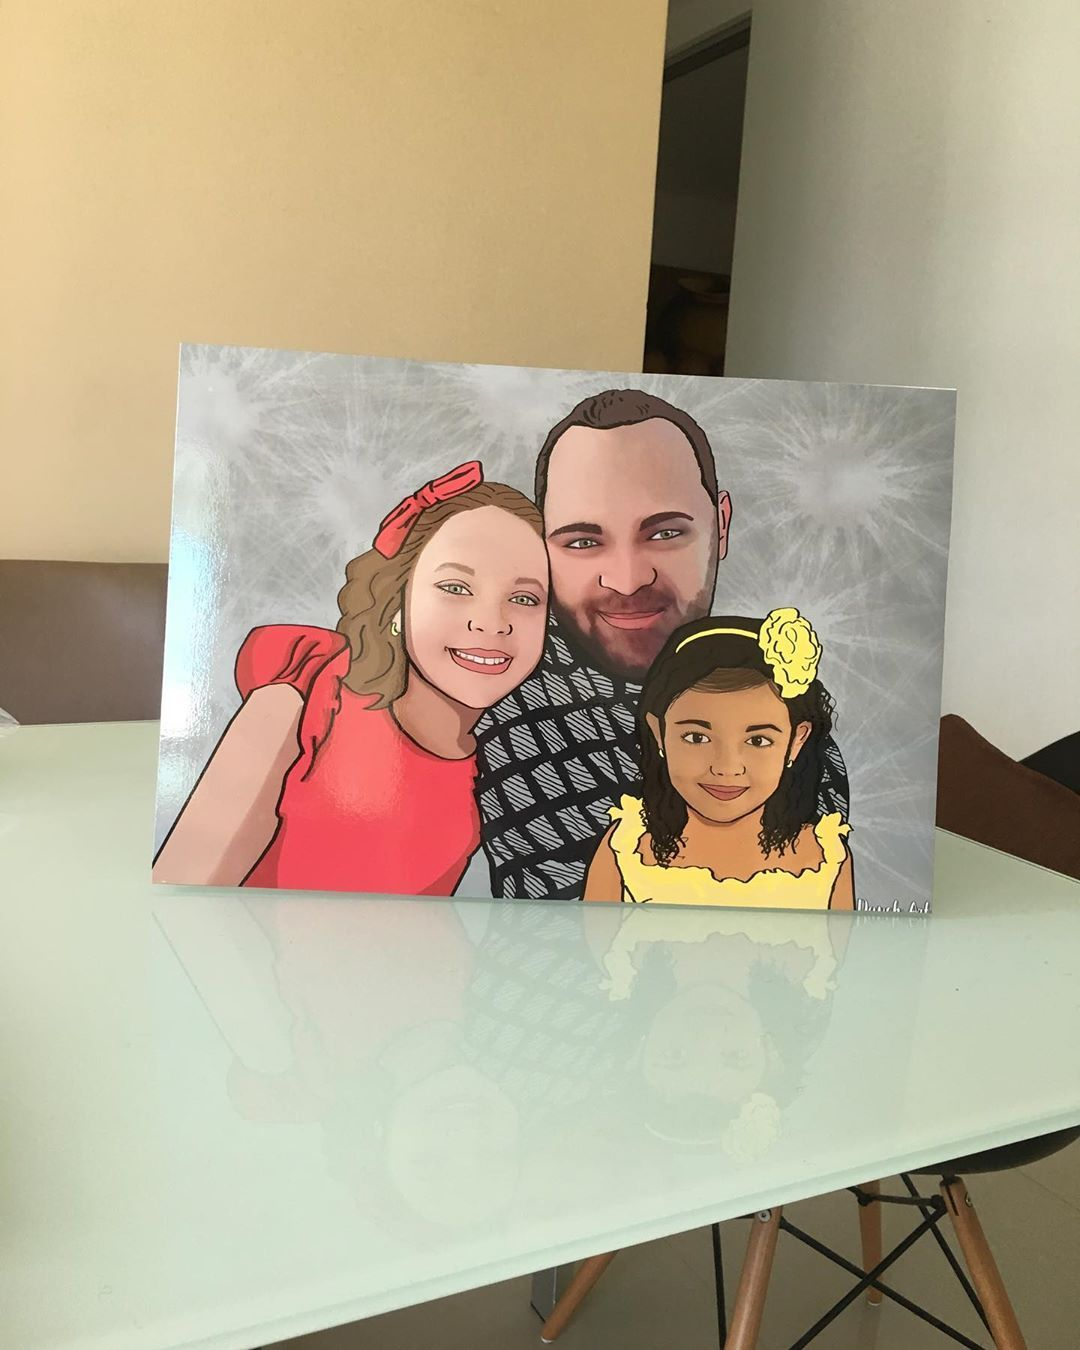 Amor de padre e hijas💕👨👧👧 Retrato tamaño 48x33 . . . . . . . . . . . #art #love #artist #photography #drawing #photooftheday #fashion #beautiful #instagram #cute #artwork #photo #illustrator #picoftheday #illustration #design #sketch #dog #painting #happy #portrait #retrato #arte #pareja #couple #arte #dibujo #colombia #instagram #artist #artsy #arts #artoftheday